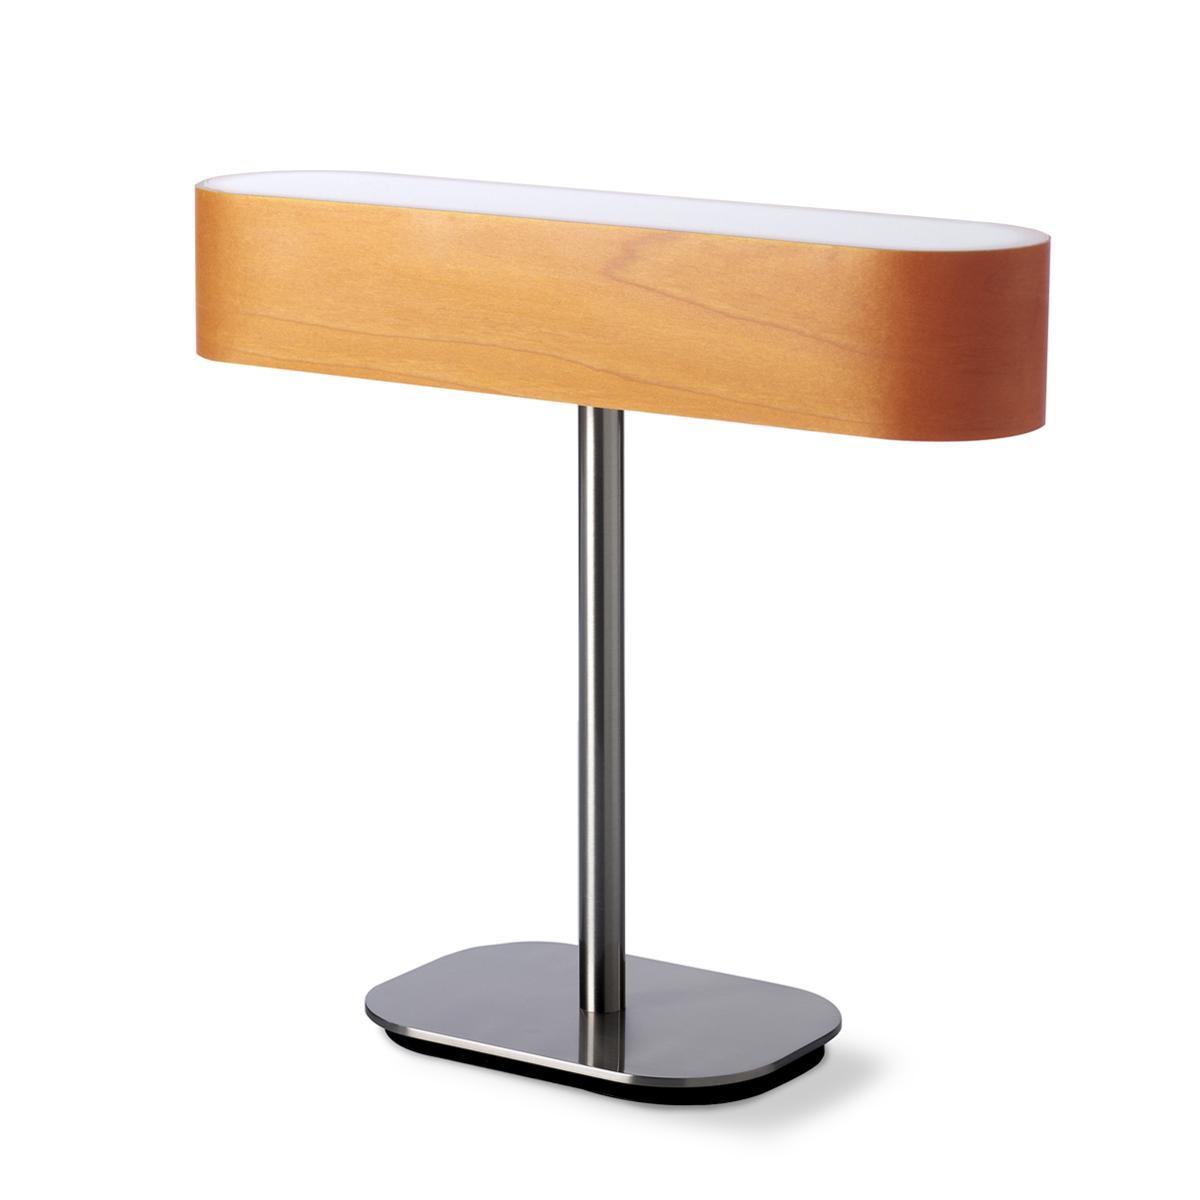 LZF Lamps I-Club LED Tischleuchte I M LED DIM 25